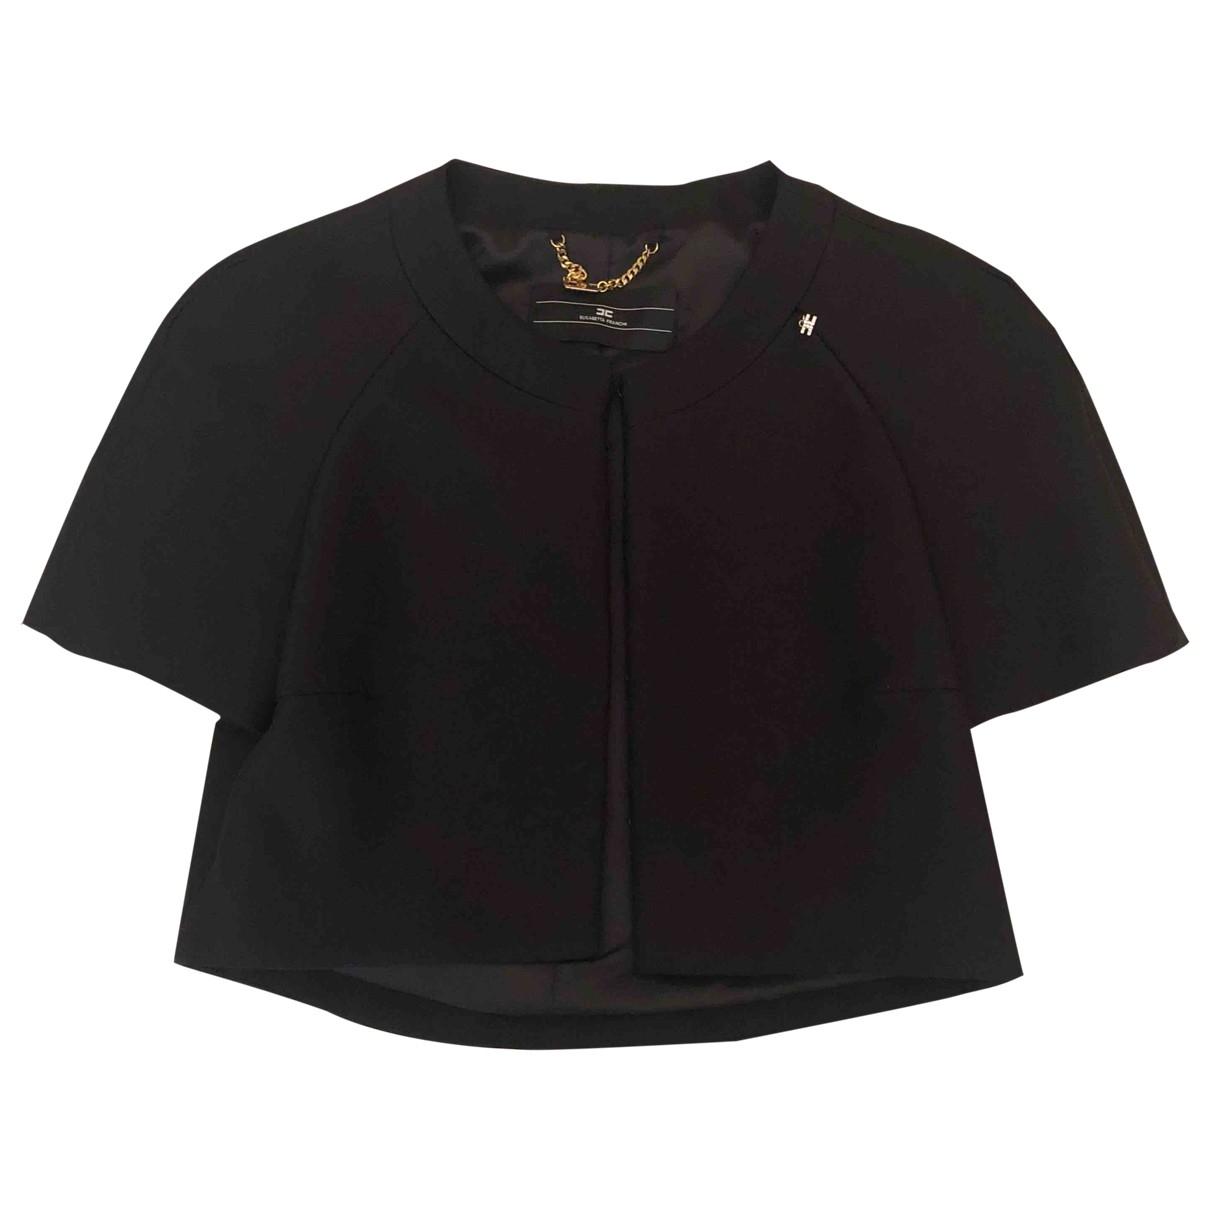 Elisabetta Franchi \N Black jacket for Women 42 IT